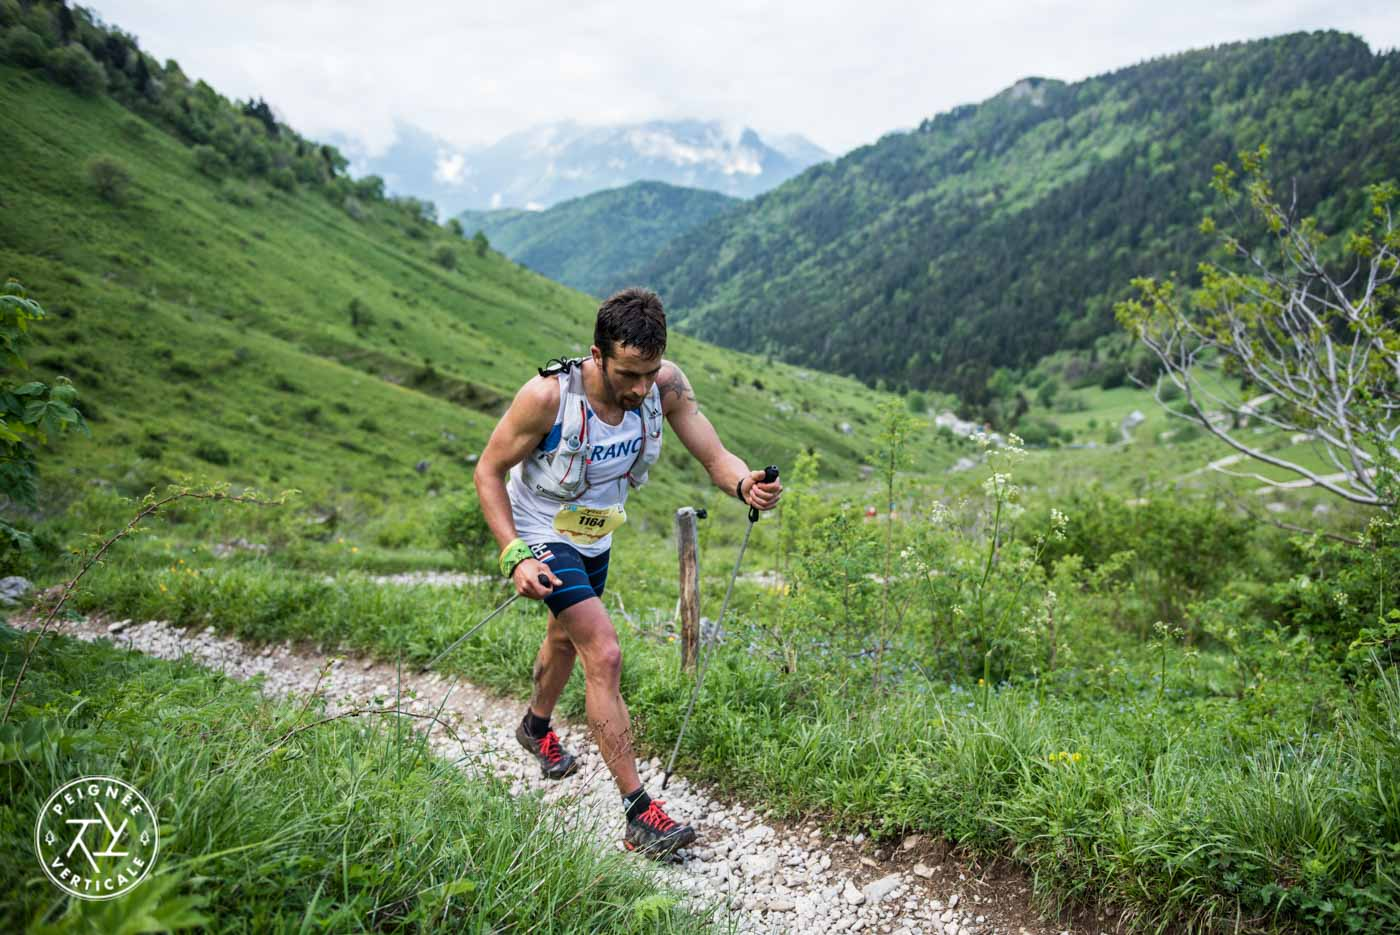 Clients-Maxi-Race-2015-Timothee-Nalet-Photographe-6073.jpg